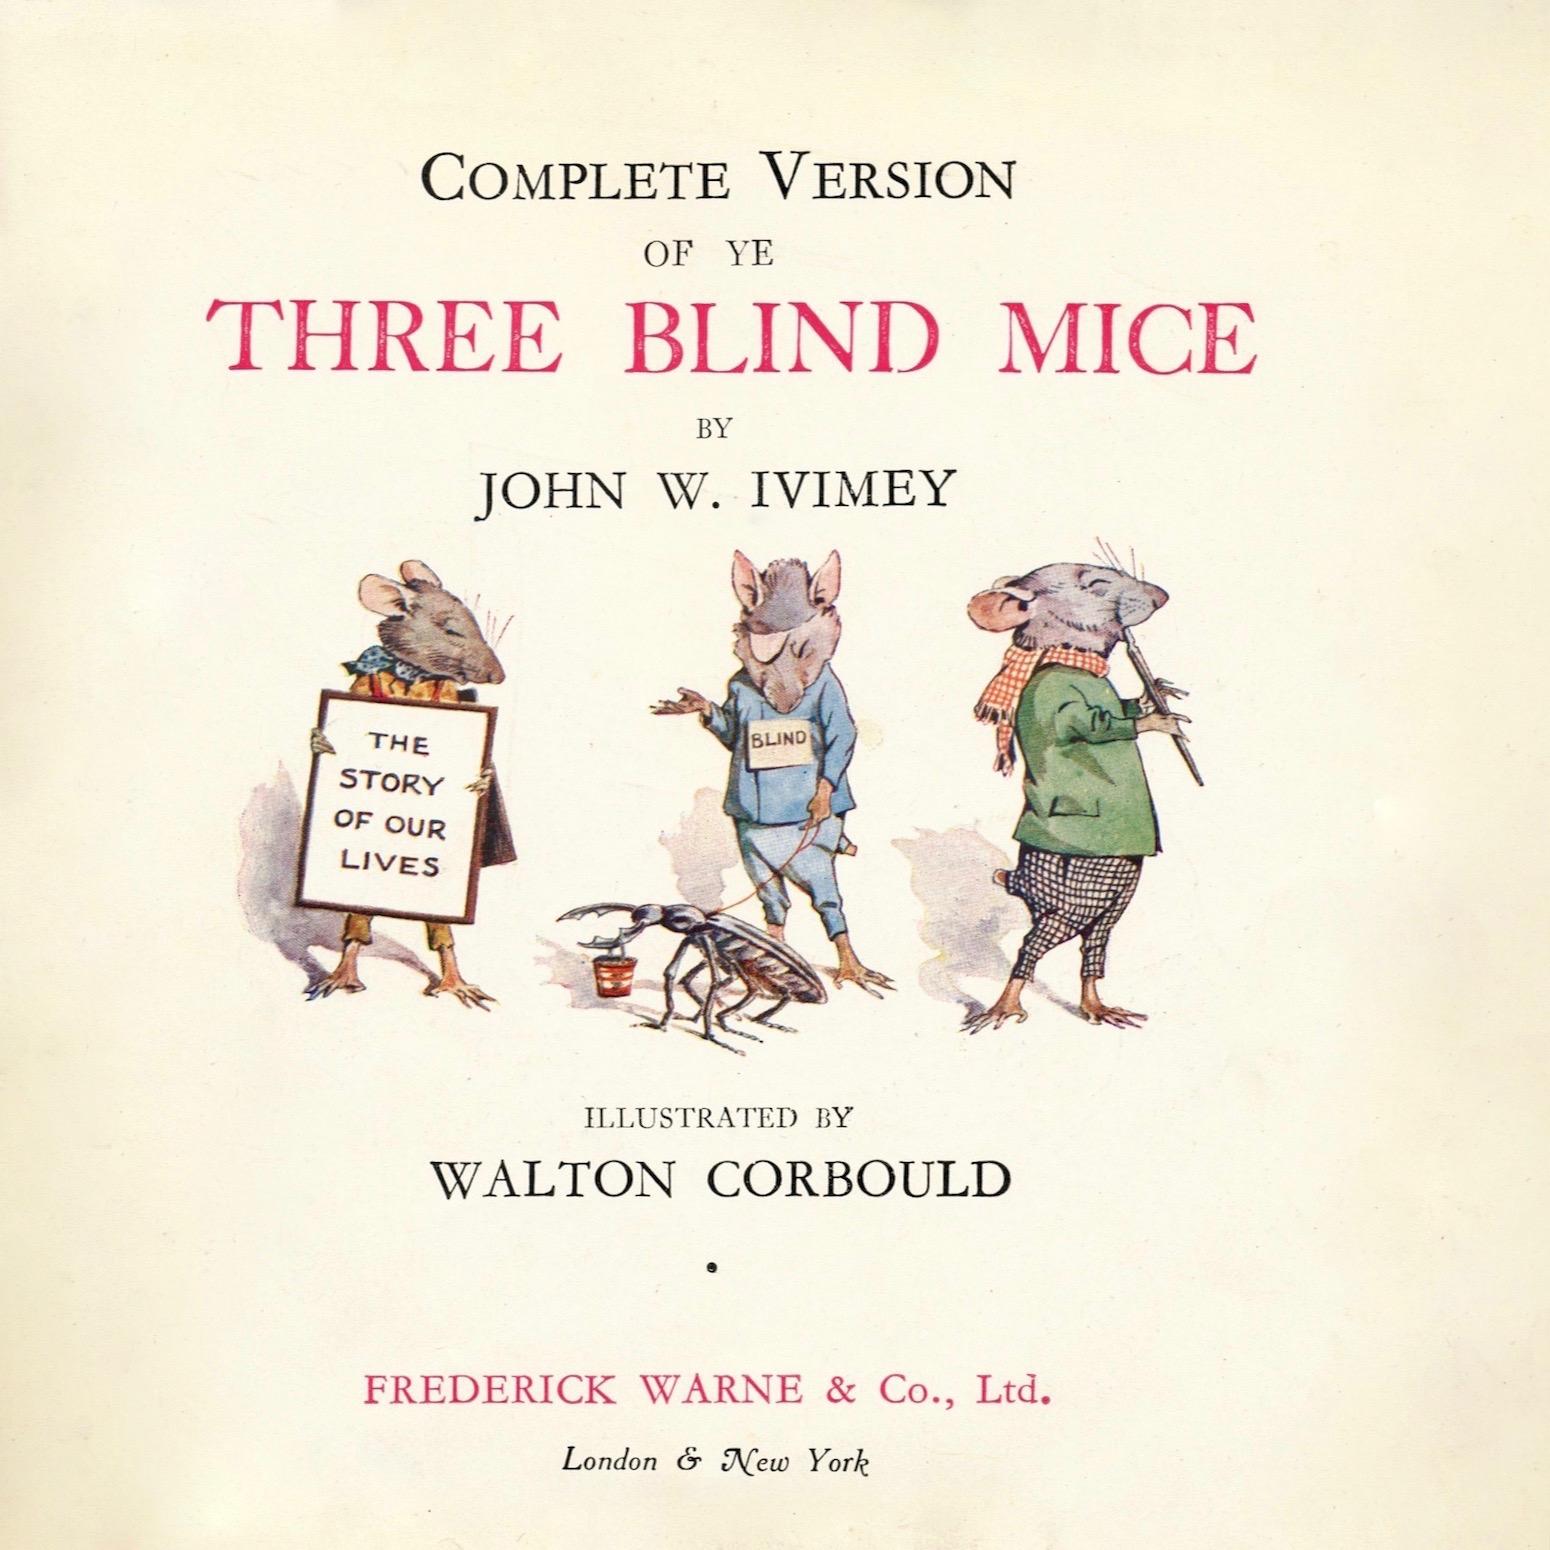 John W. Ivimey,  Ye Three Blind Mice , illustrated by Walton Corbould (1909).